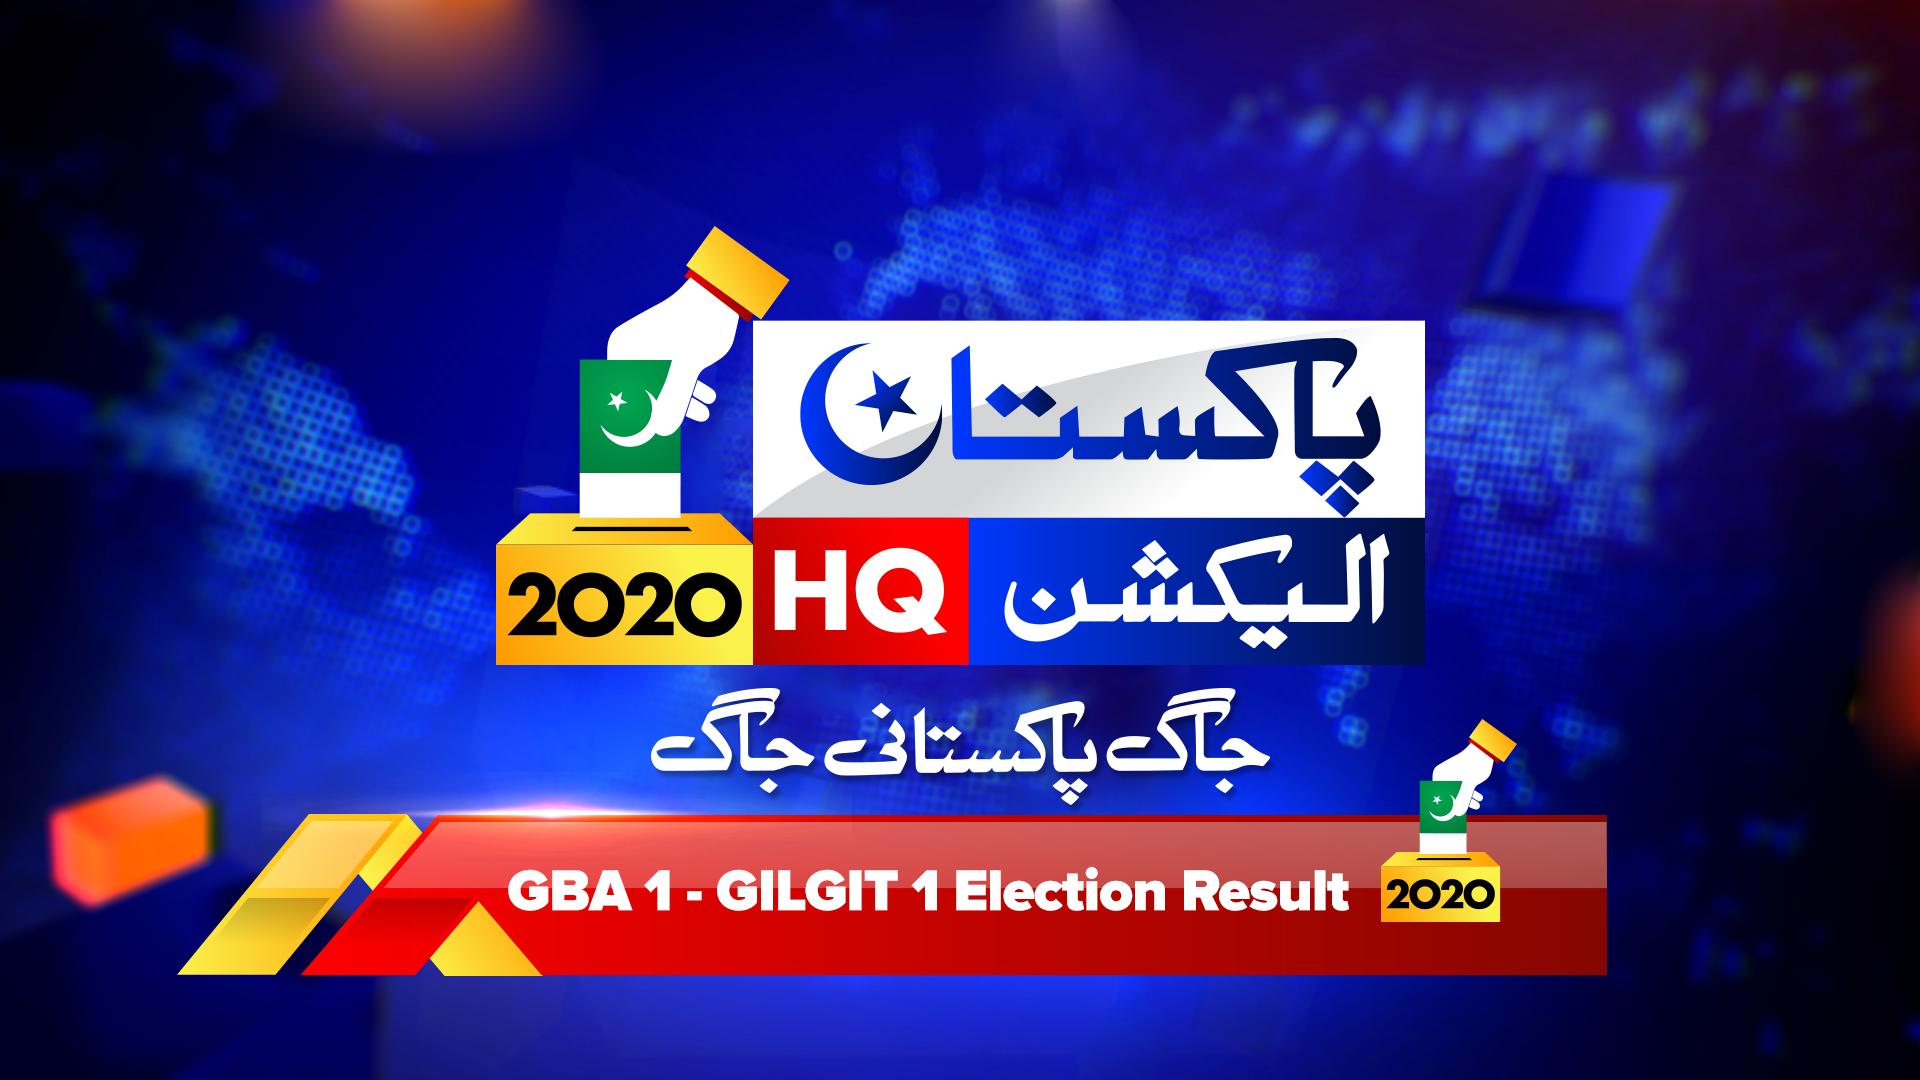 GBA 1 Gilgit 1 Election Result